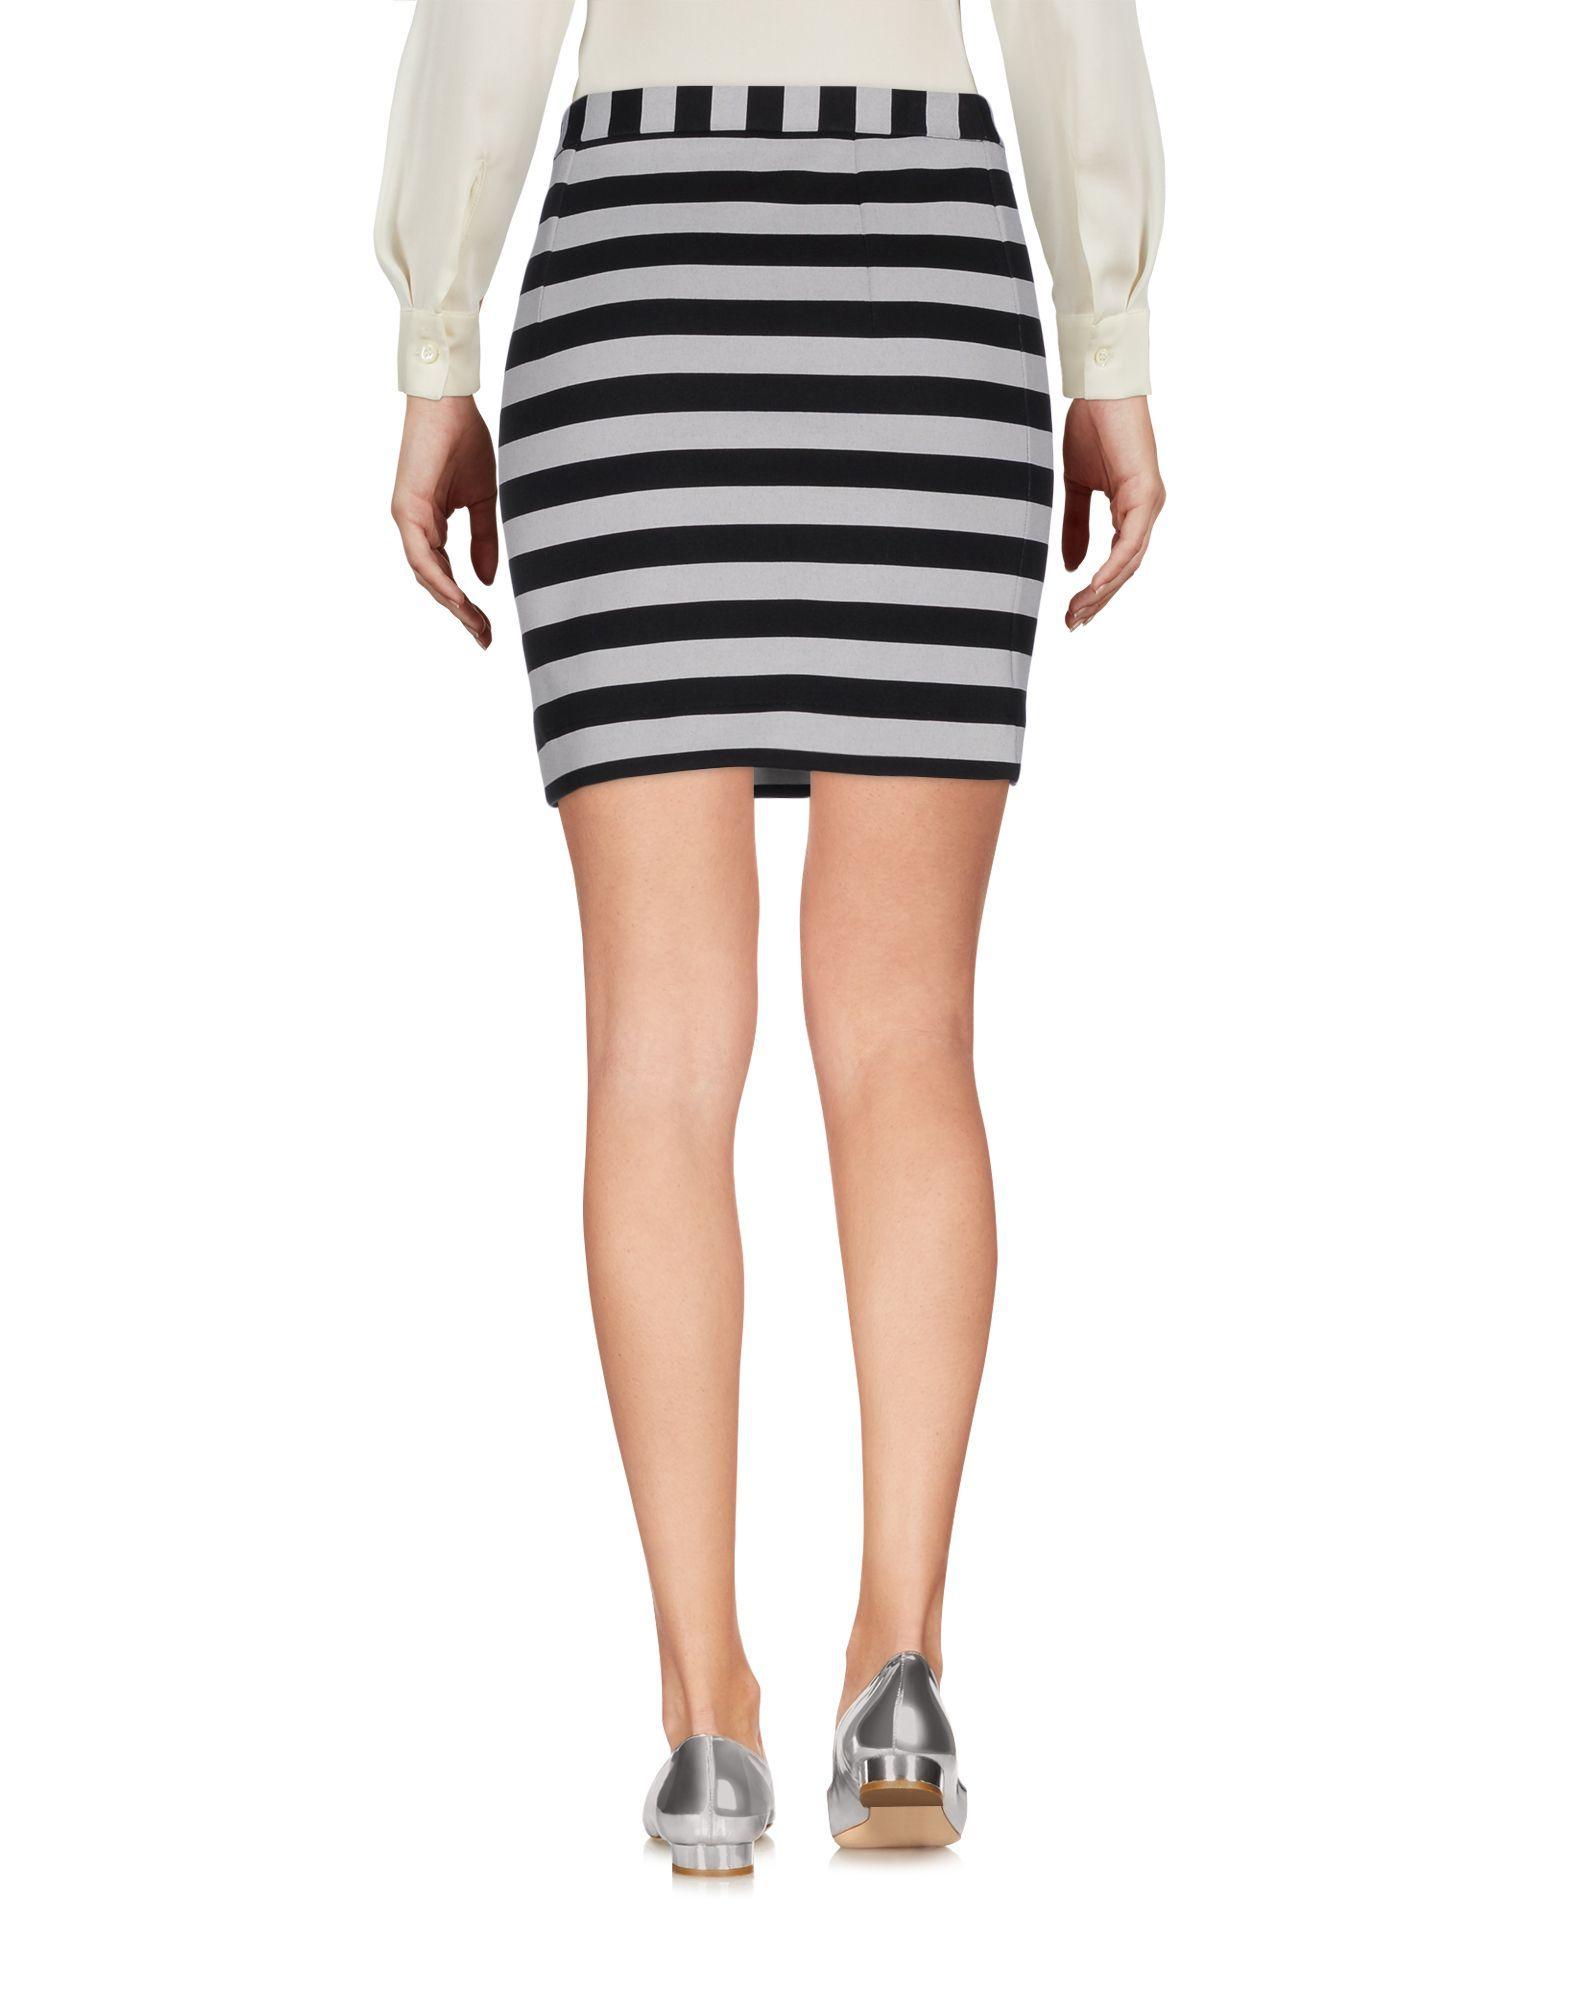 Patrizia Pepe Black Stripe Cotton Mini Skirt